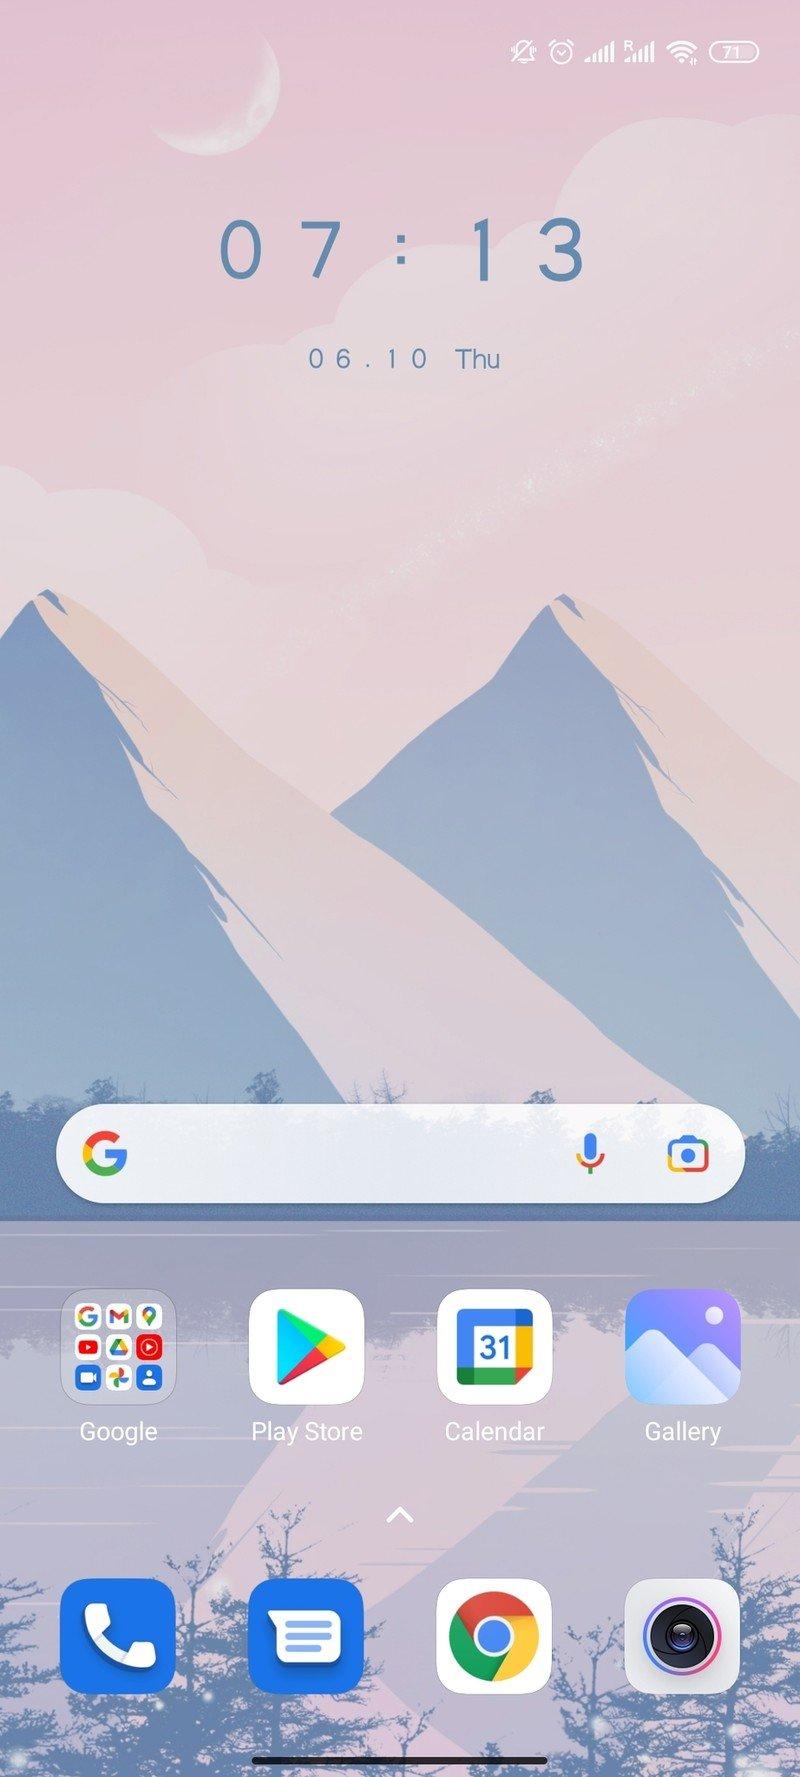 android-11-home-screenshot-1.jpg